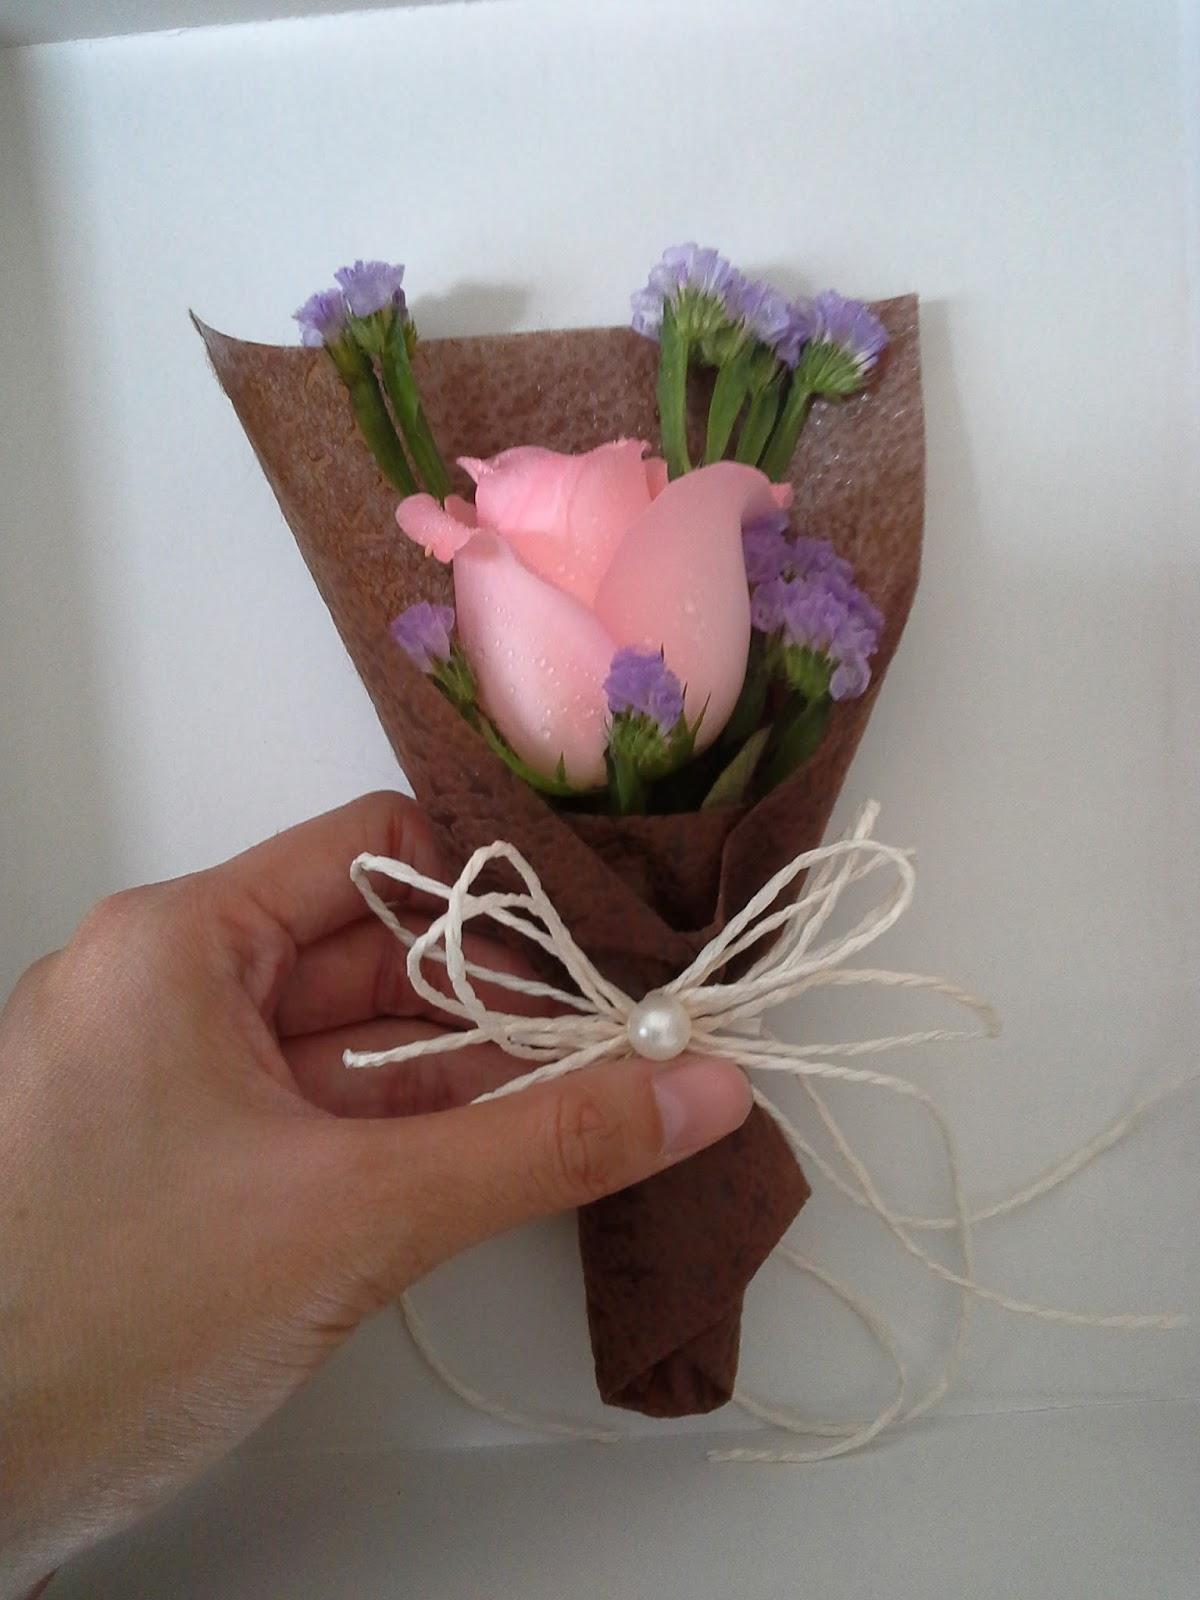 Ipoh Florist Yen Floral053120394 47lebuh Lapangan Siber 1bandar